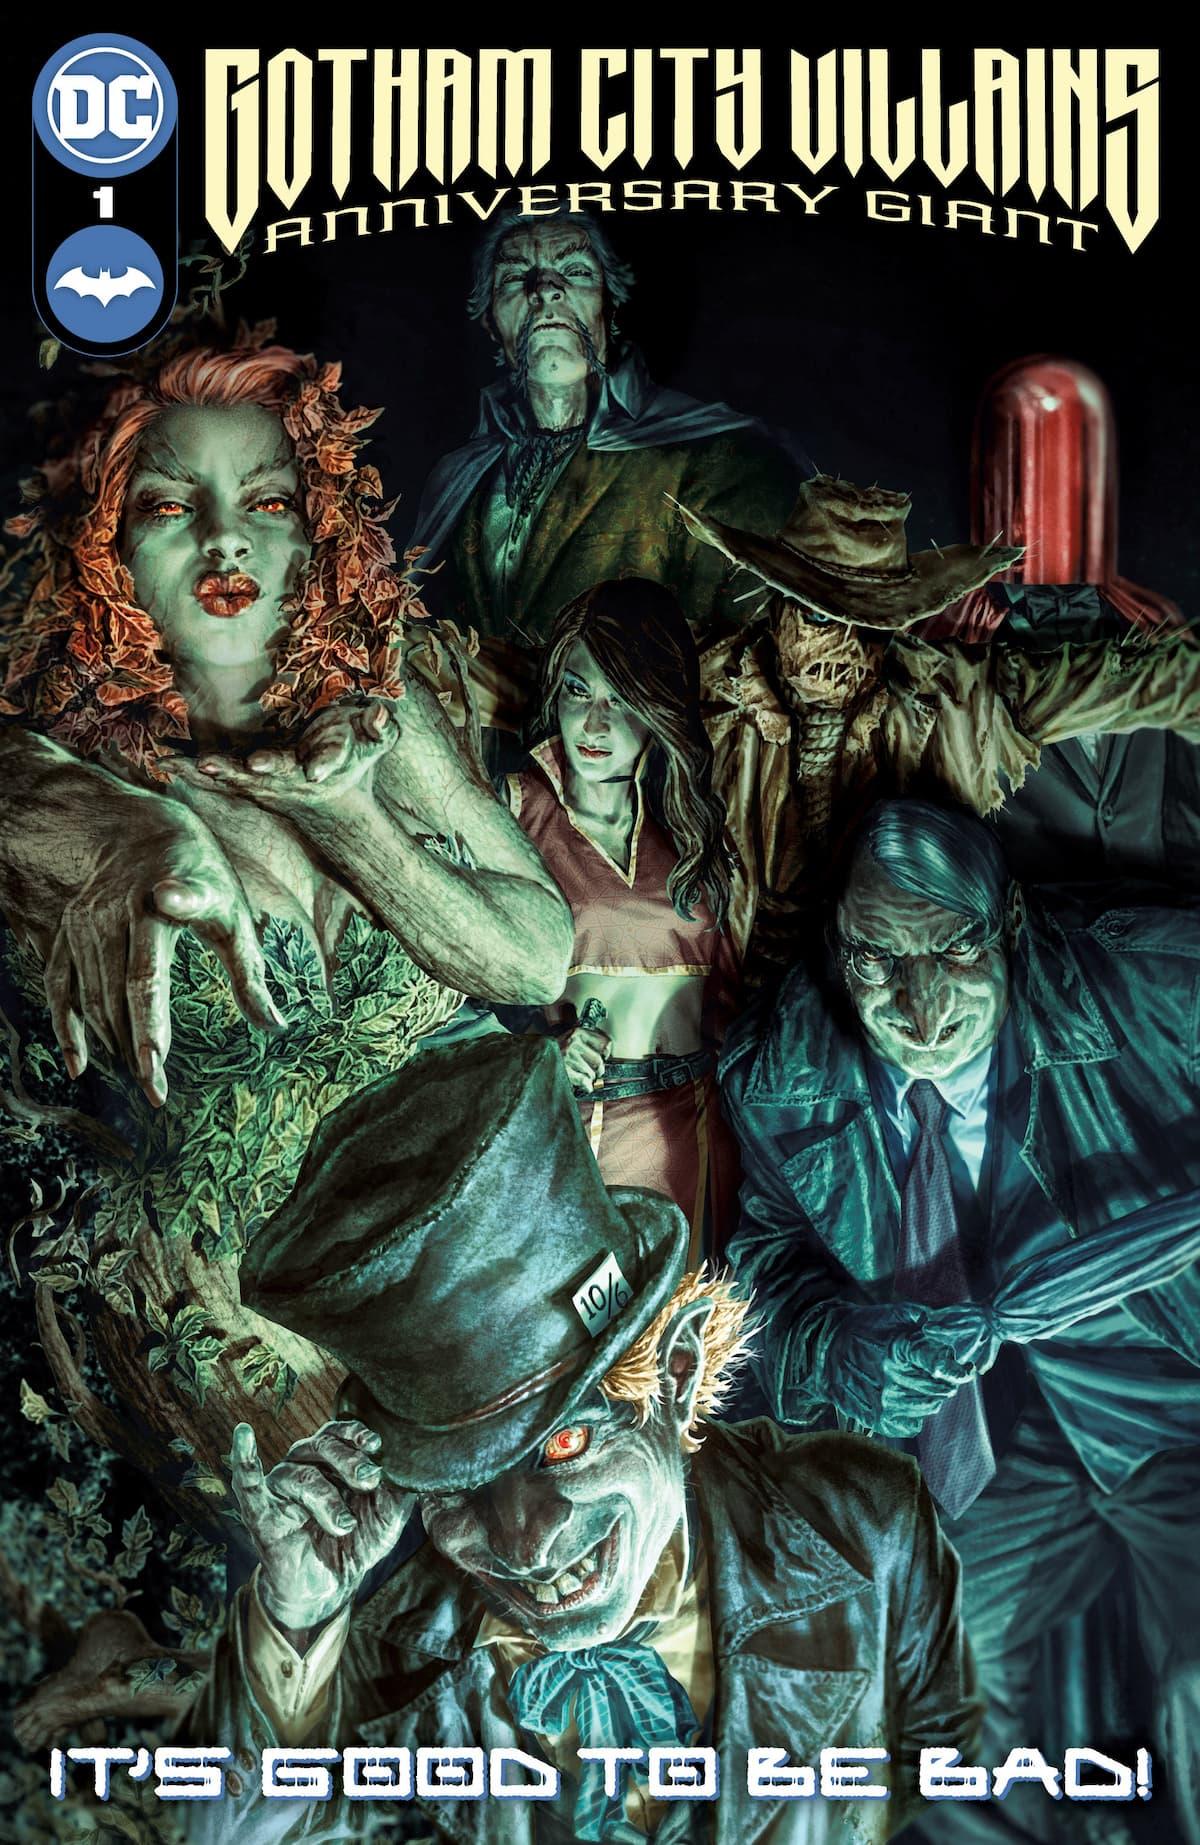 Gotham-City-Villains-Giant-Cv1